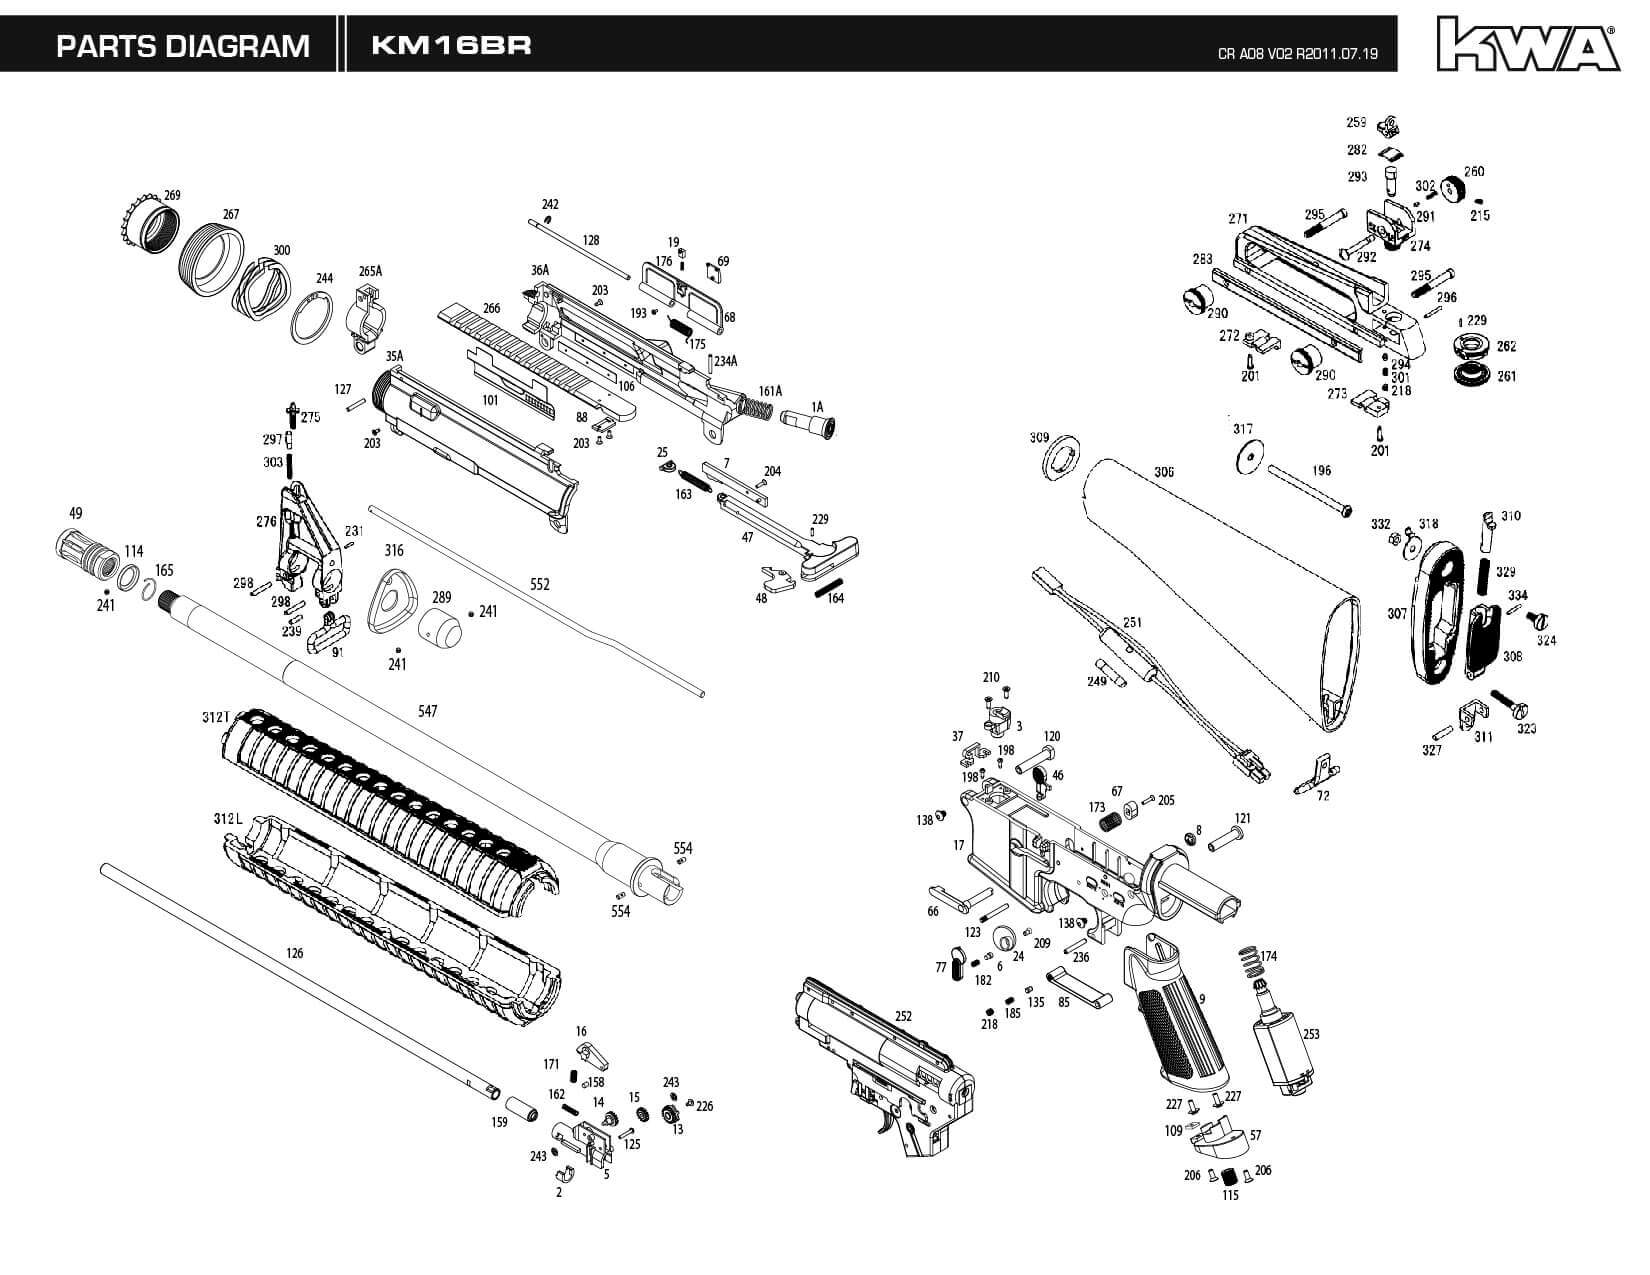 cqb diagrams downloads – kwa airsoft